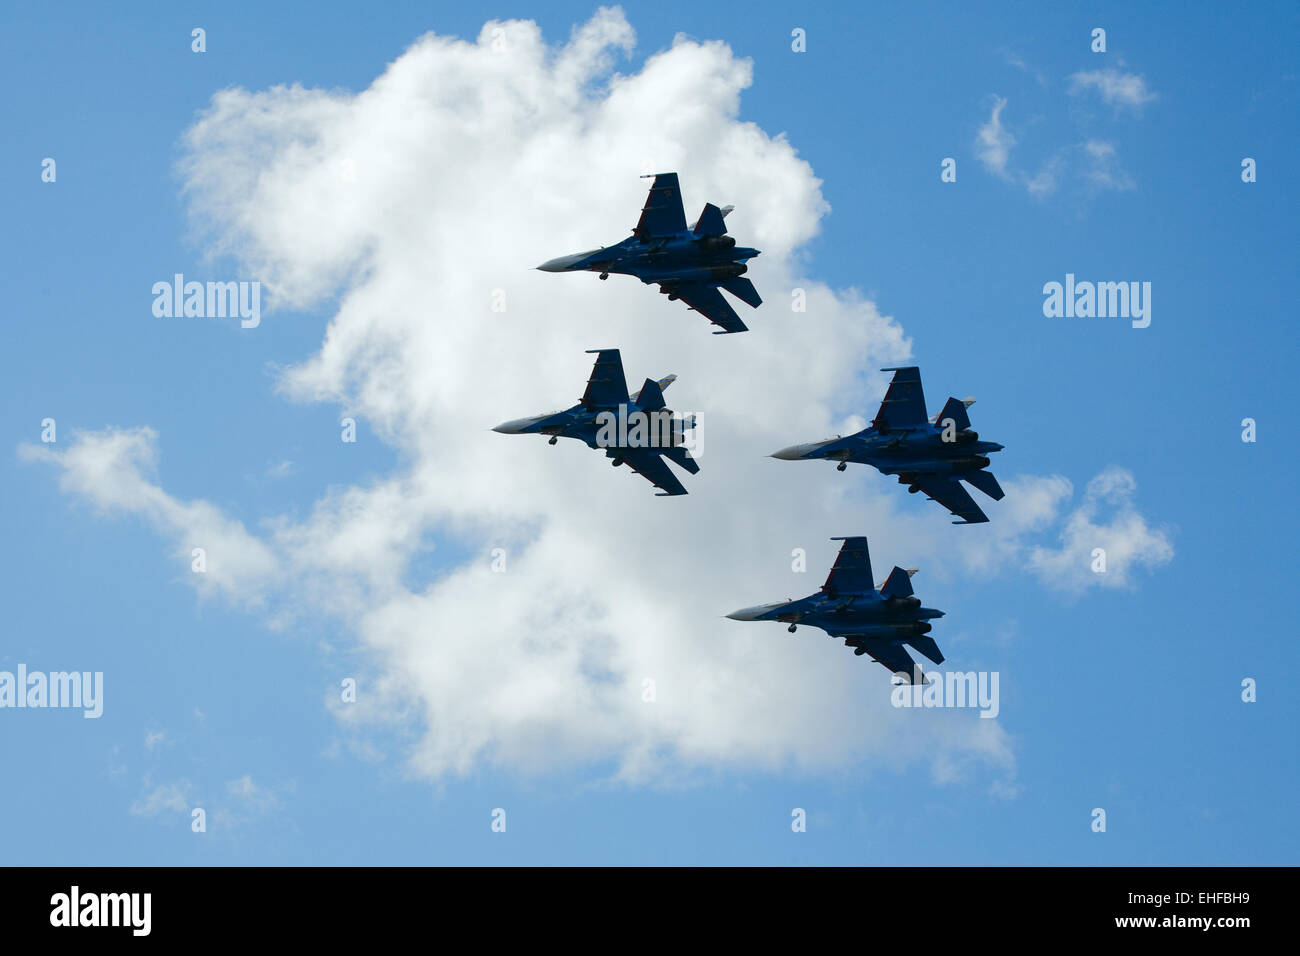 Aerobatic group - Stock Image